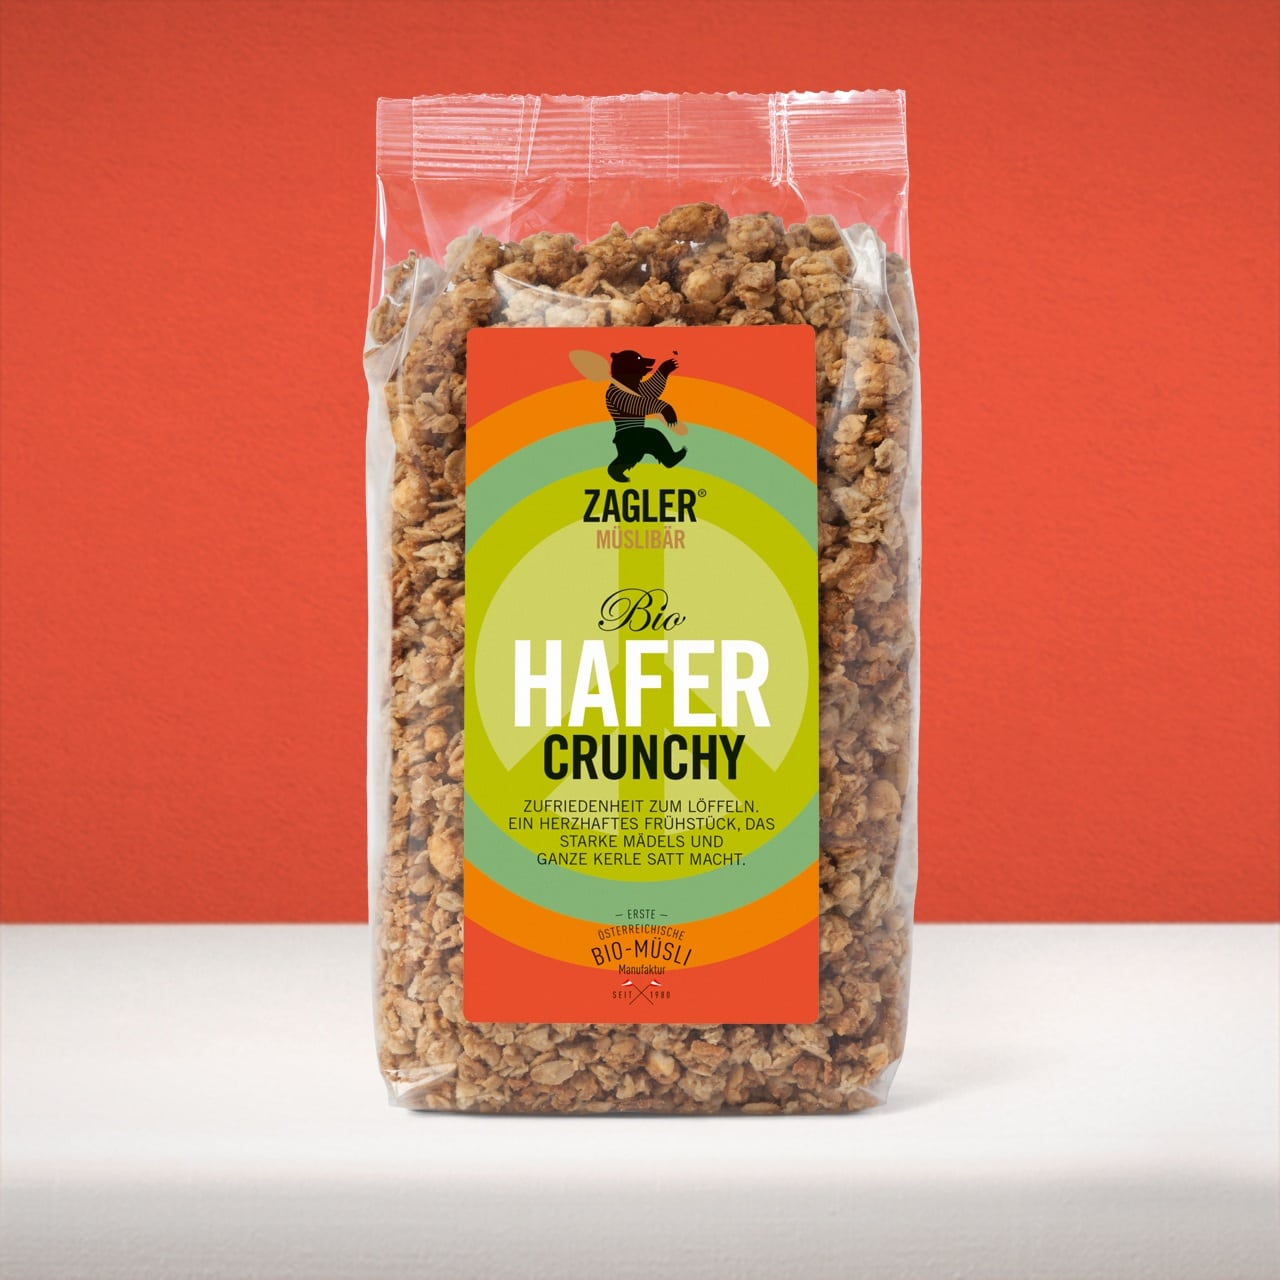 Bio Hafer Crunchy muesli